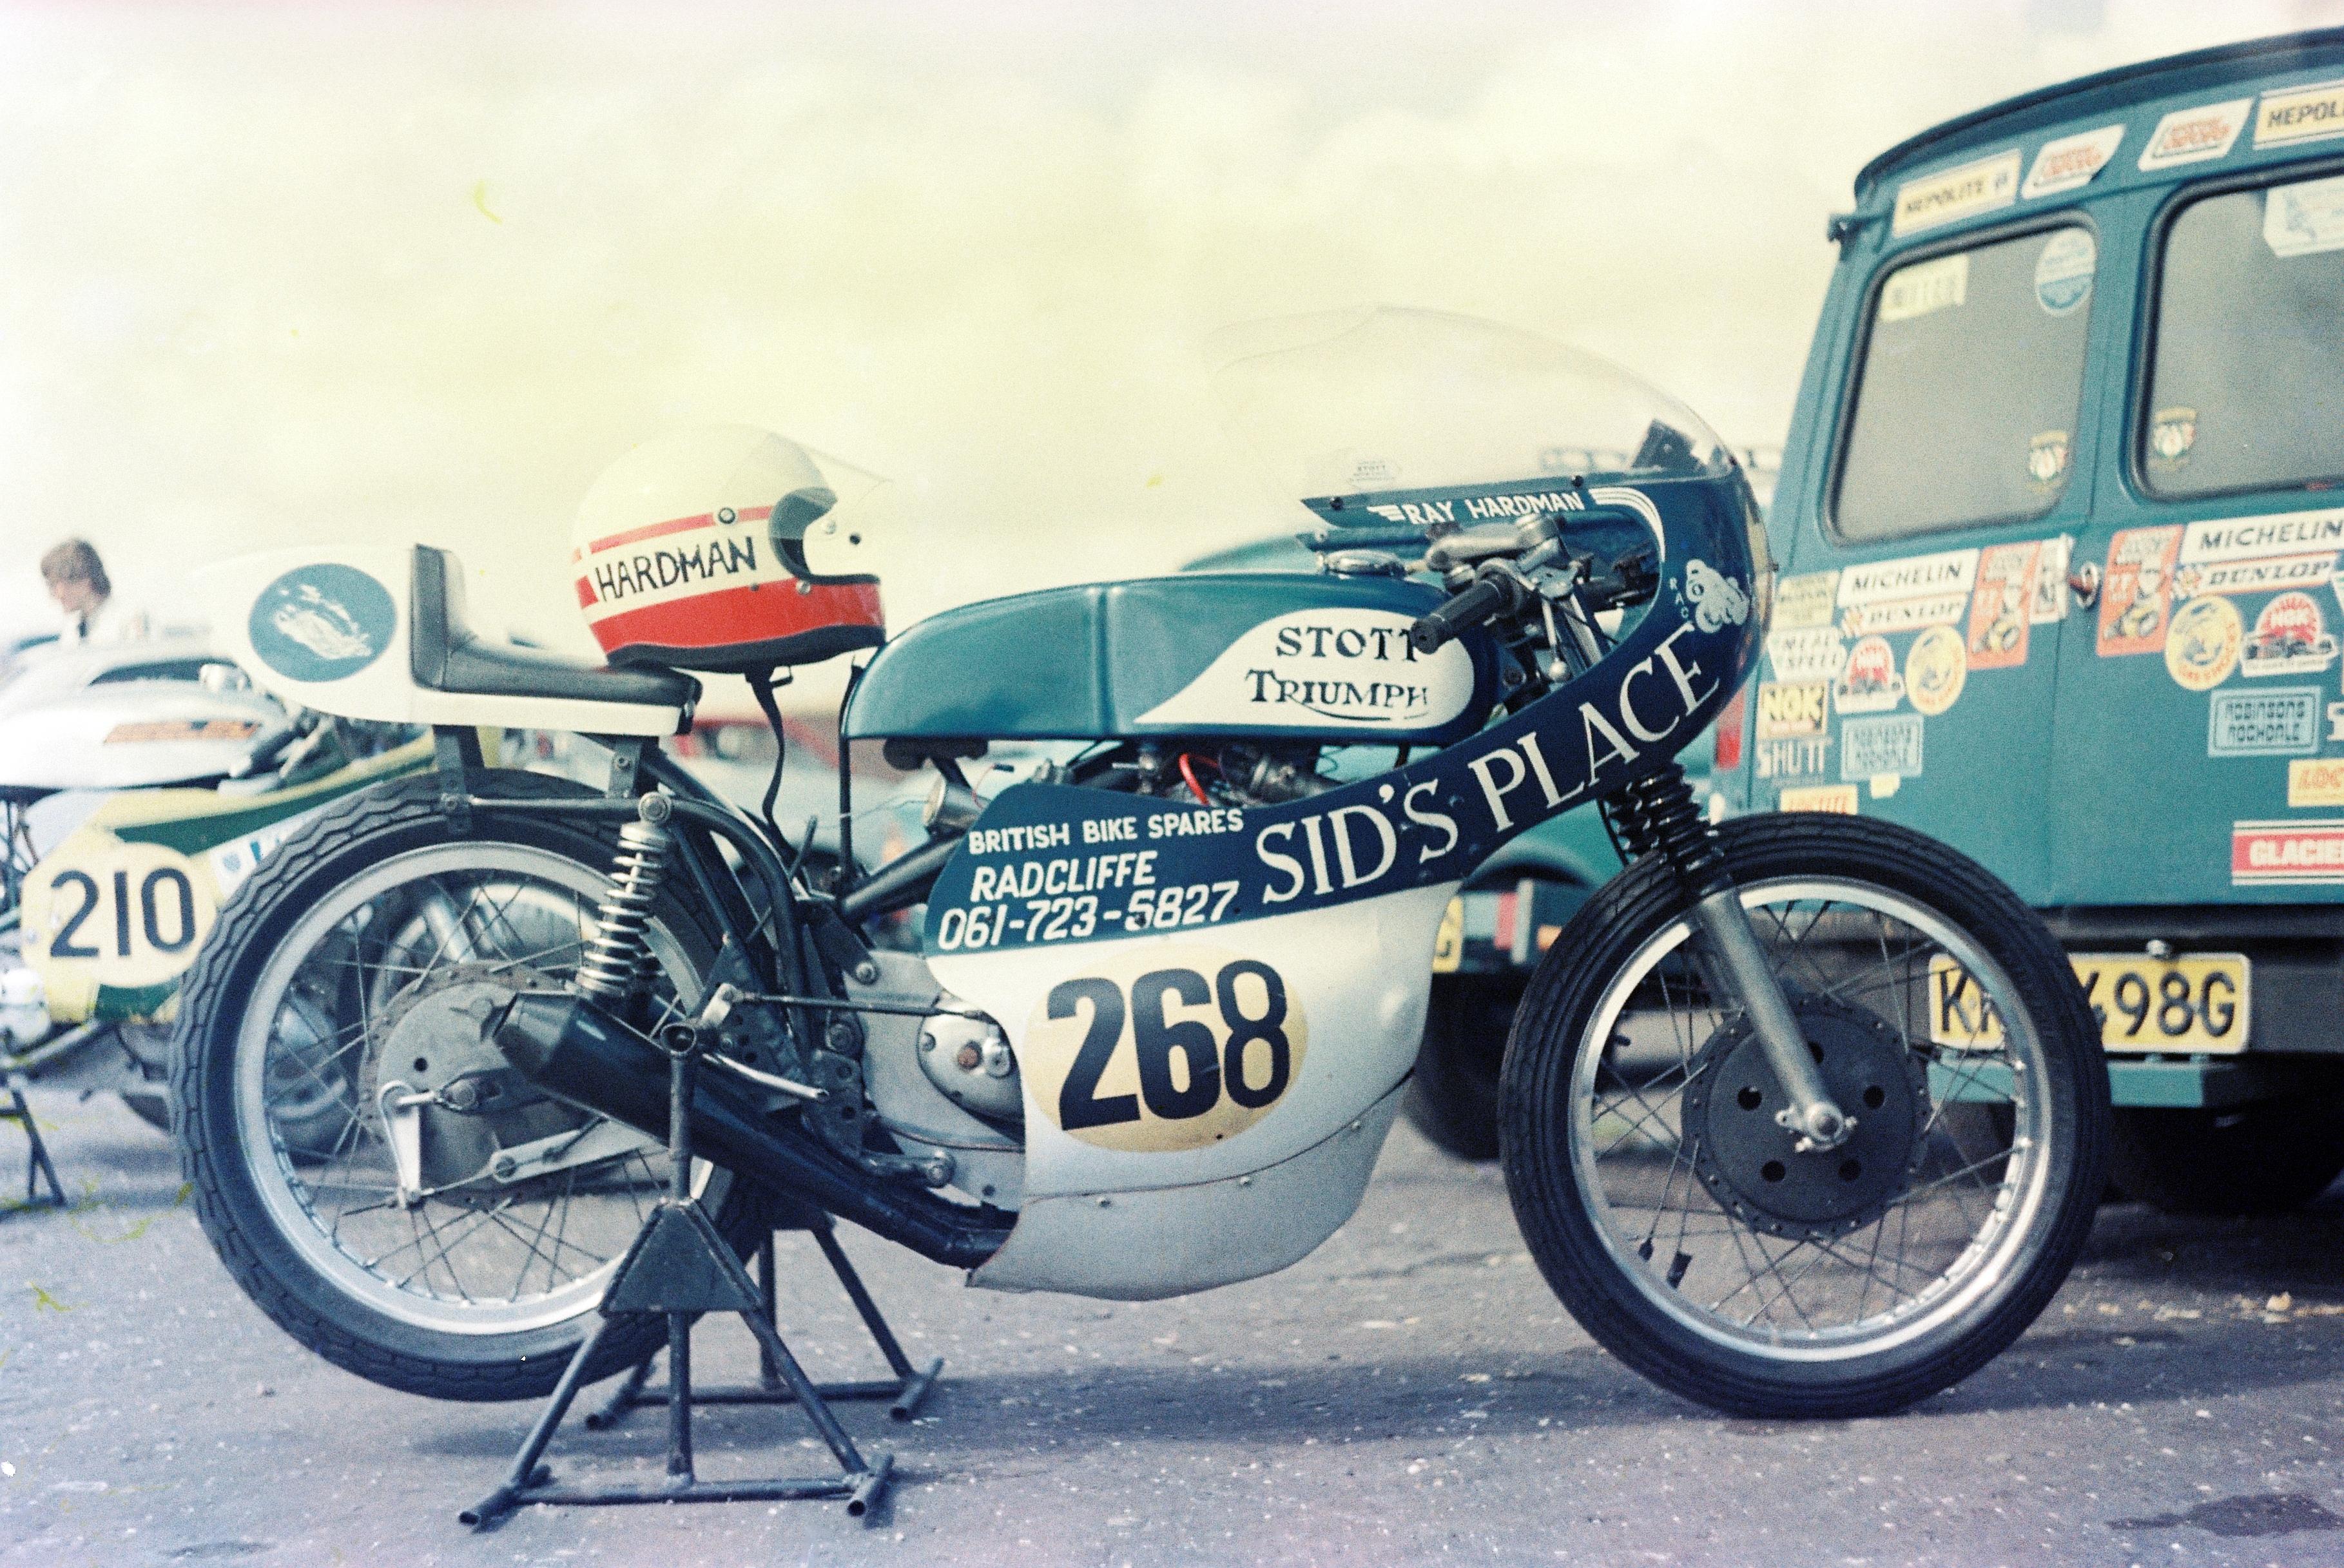 Rays Escort van and Tri-macchi racer